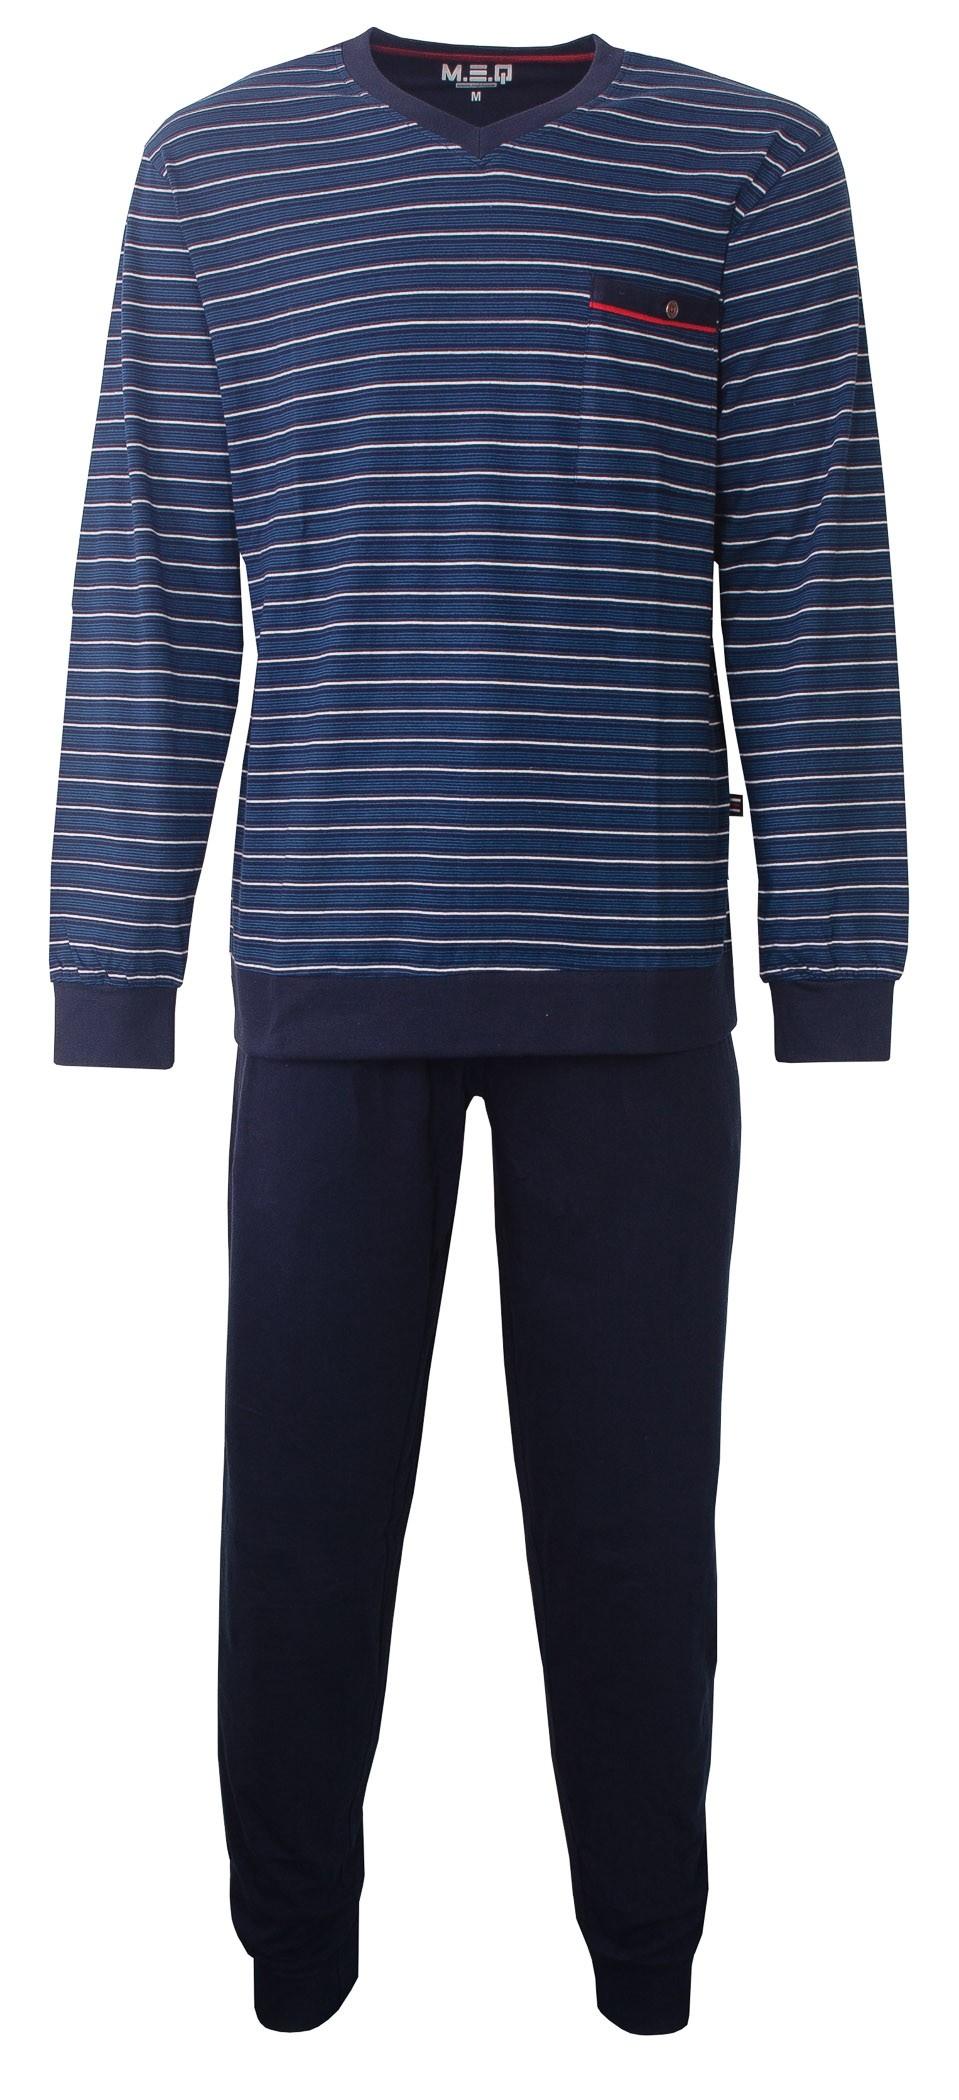 Heren pyjama MEPYH 2803A-L